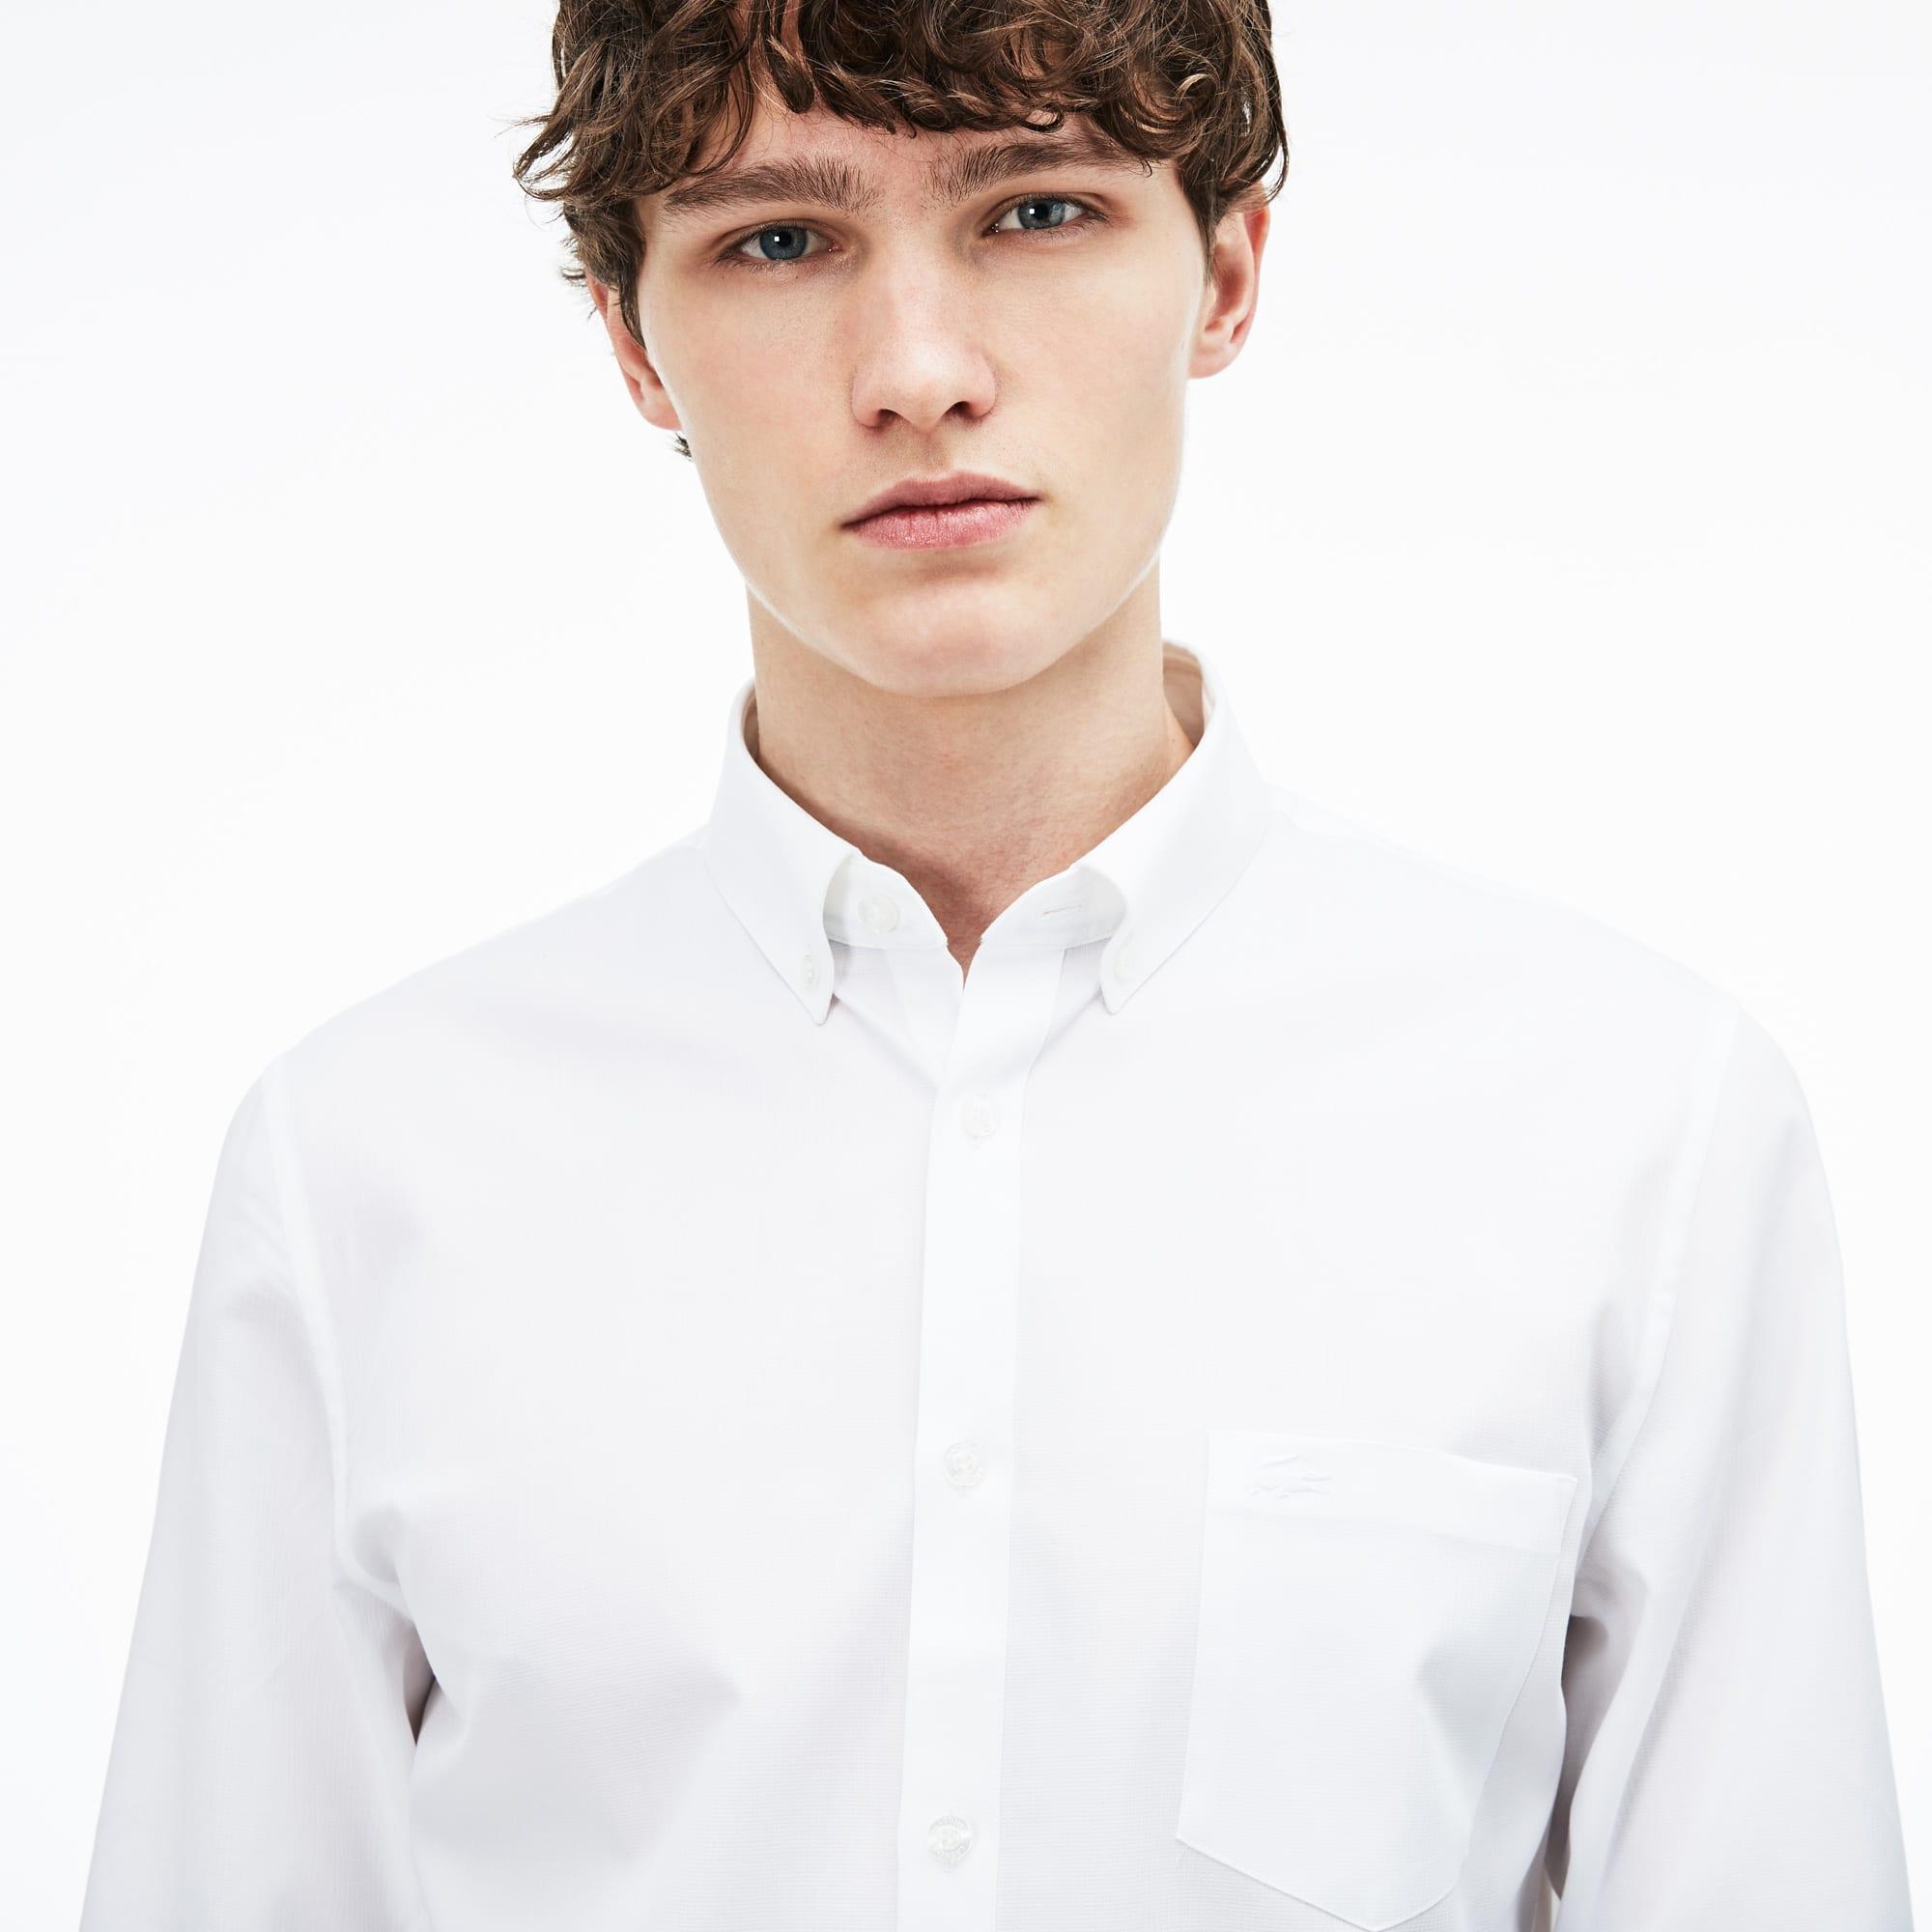 Lacoste - Regular Fit Herren-Hemd aus strukturierter Popeline - 6